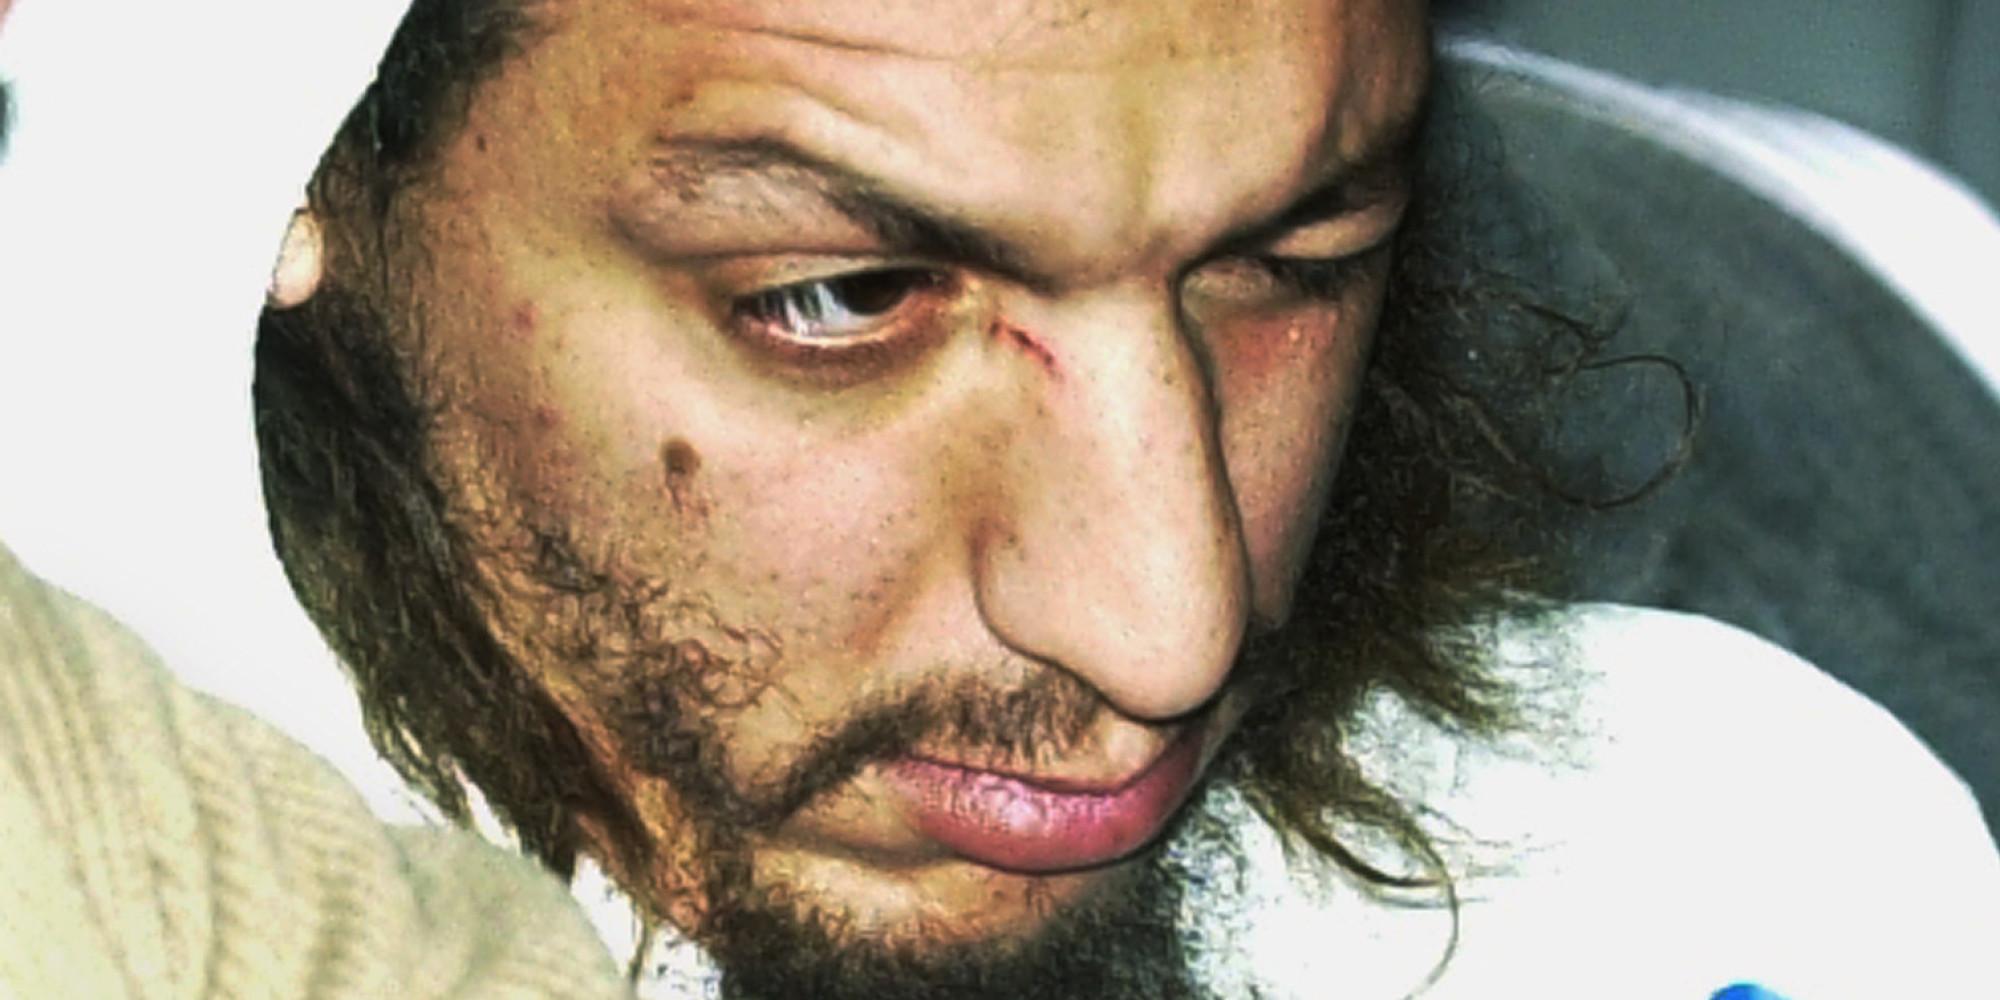 Richard Reid The Shoe Bomber Says Failed Bombing Was